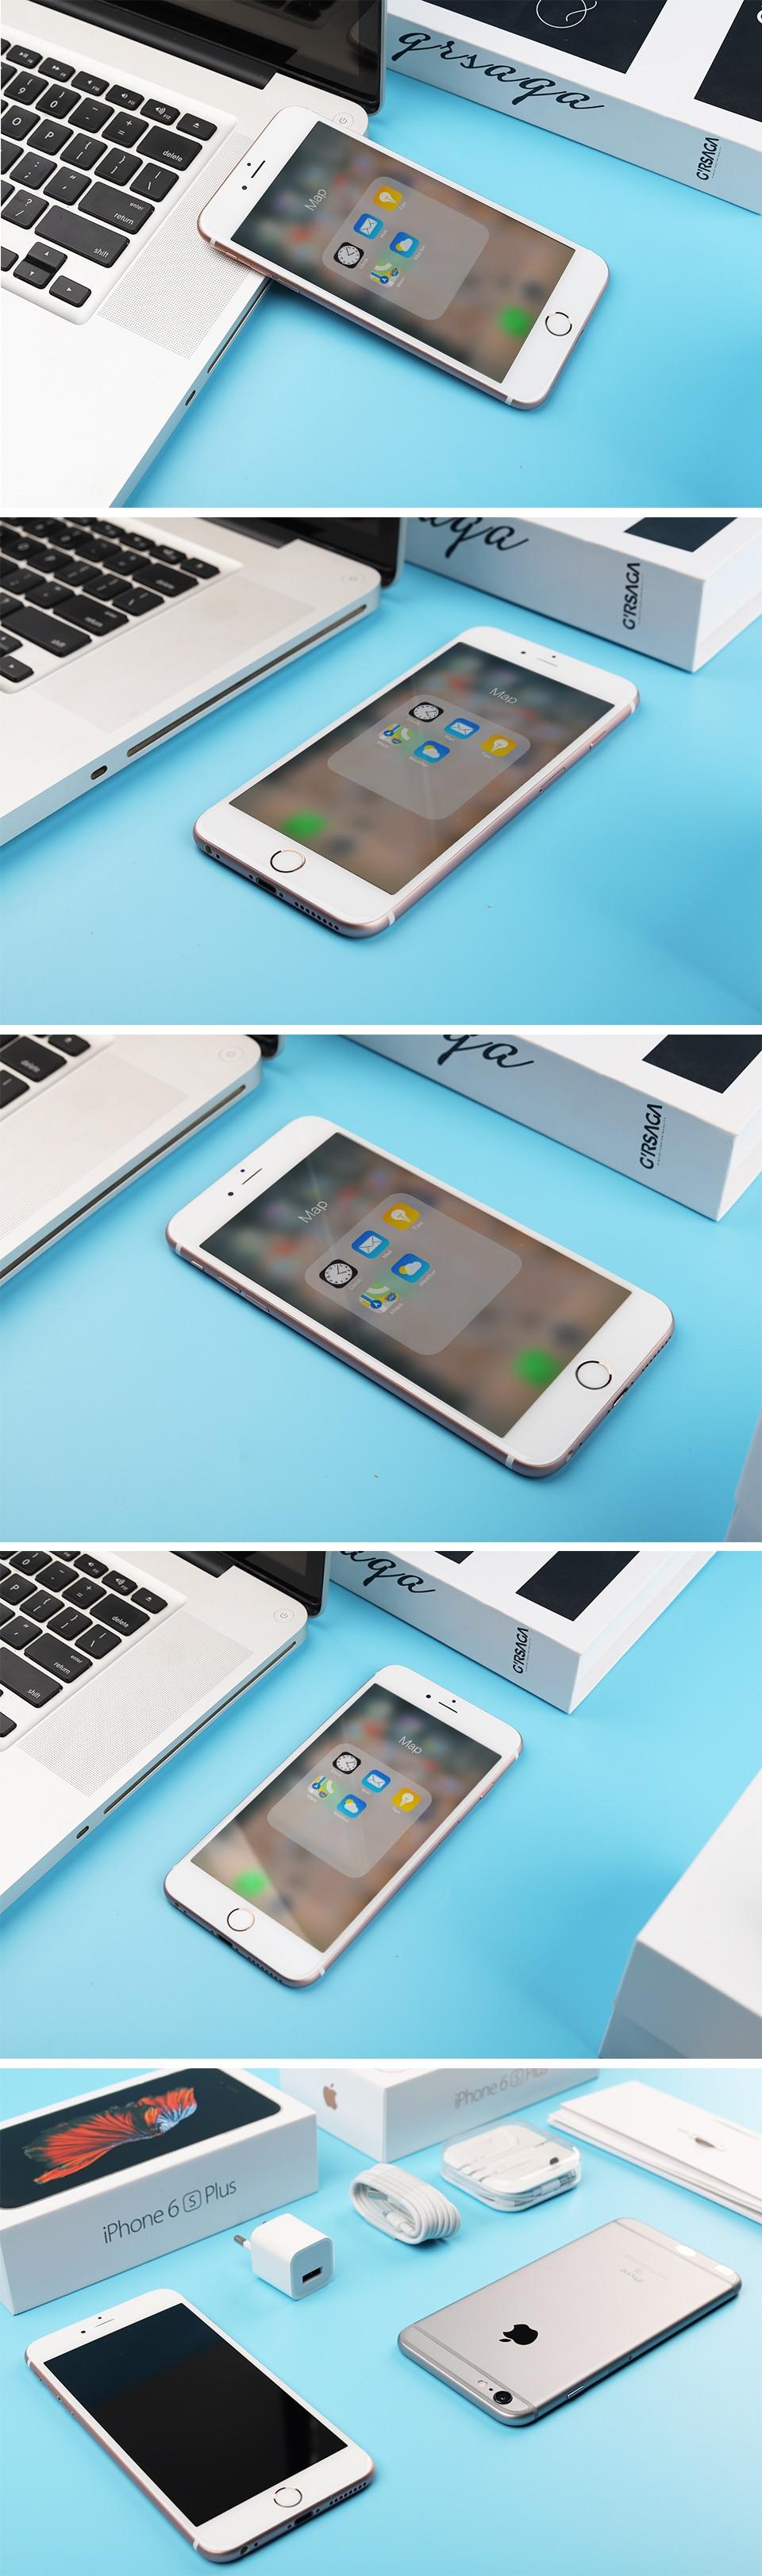 iPhone-6splua-详情页_06